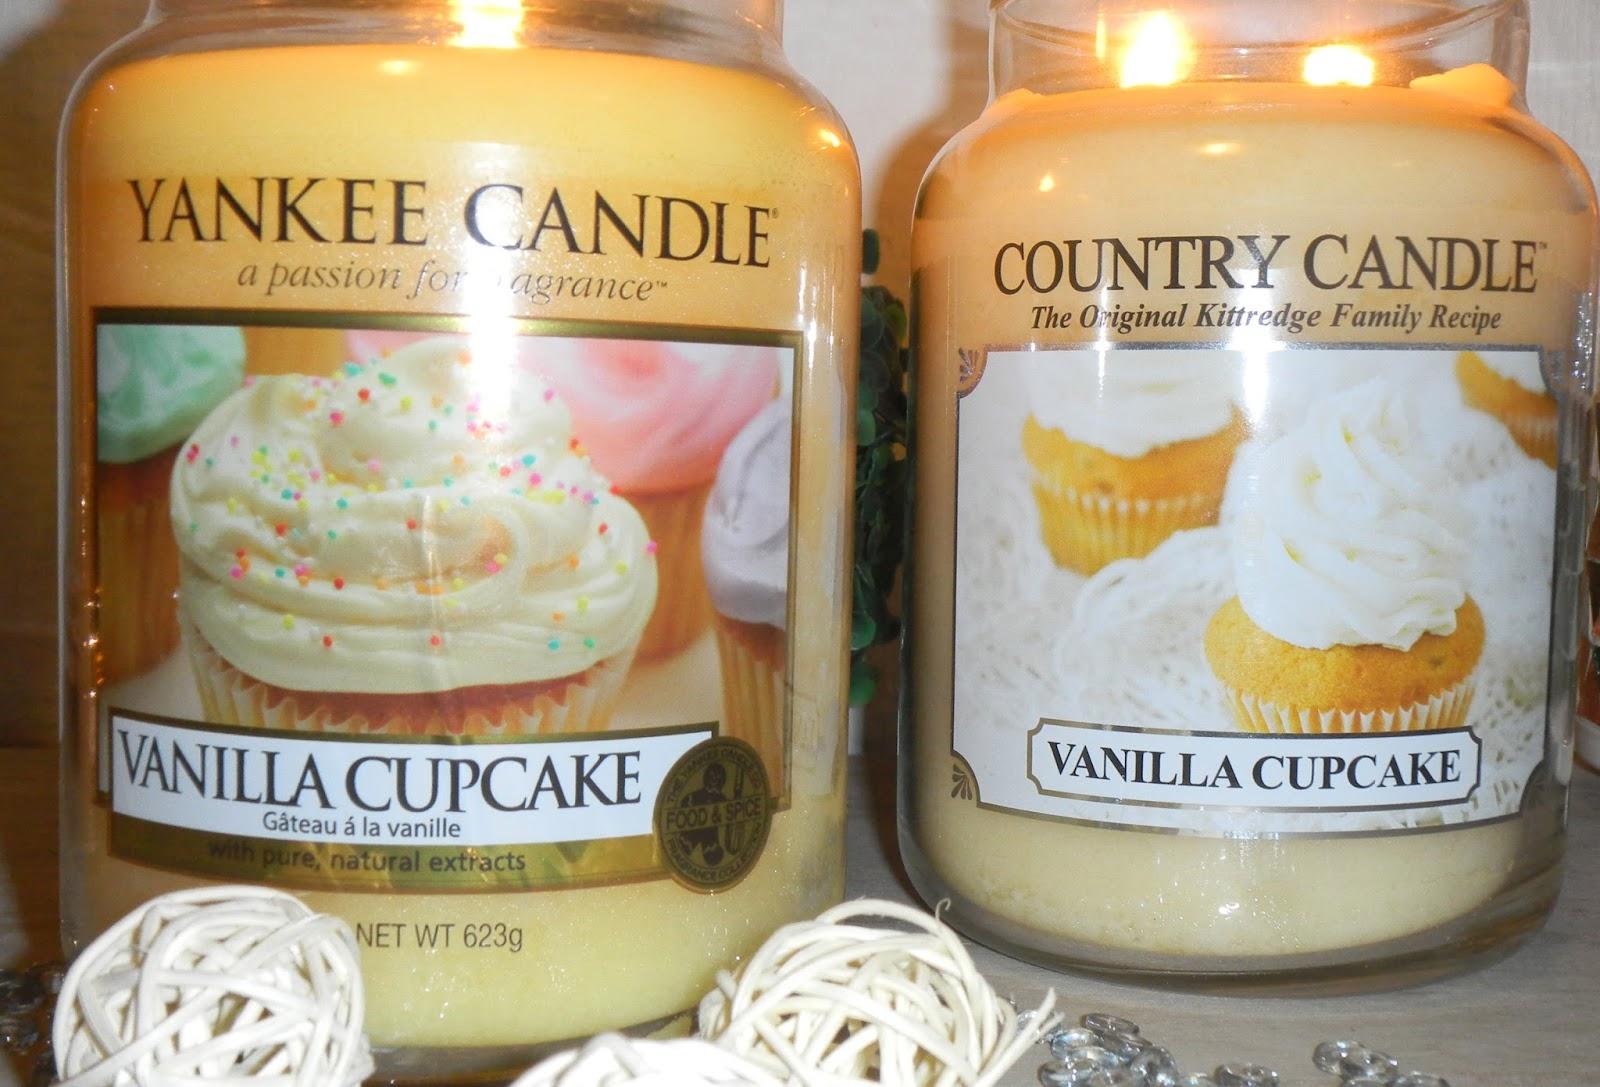 yankee candle vanilla cupcake review